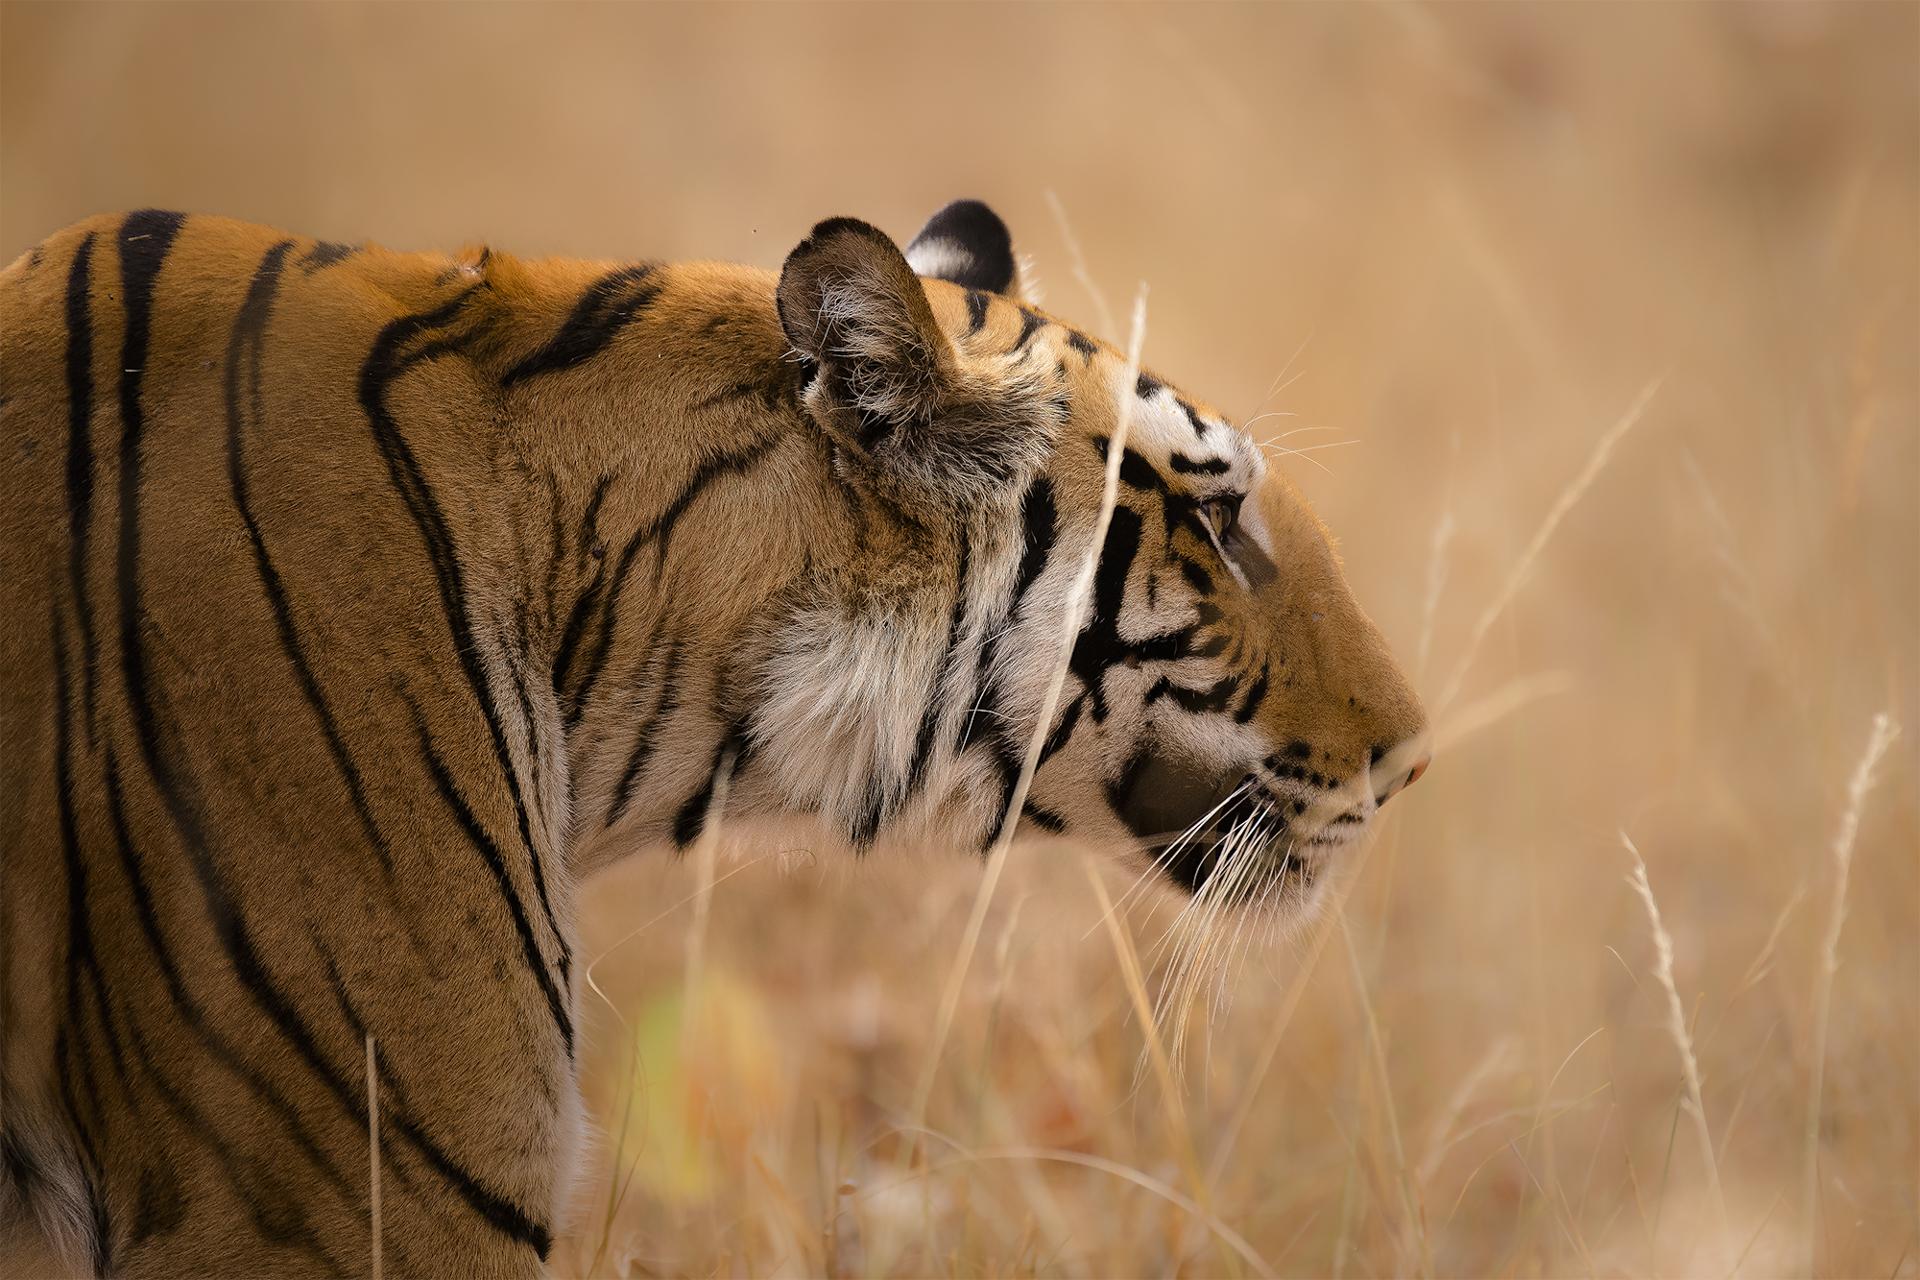 Ankit_Kumar_Tiger_Stalking.jpg